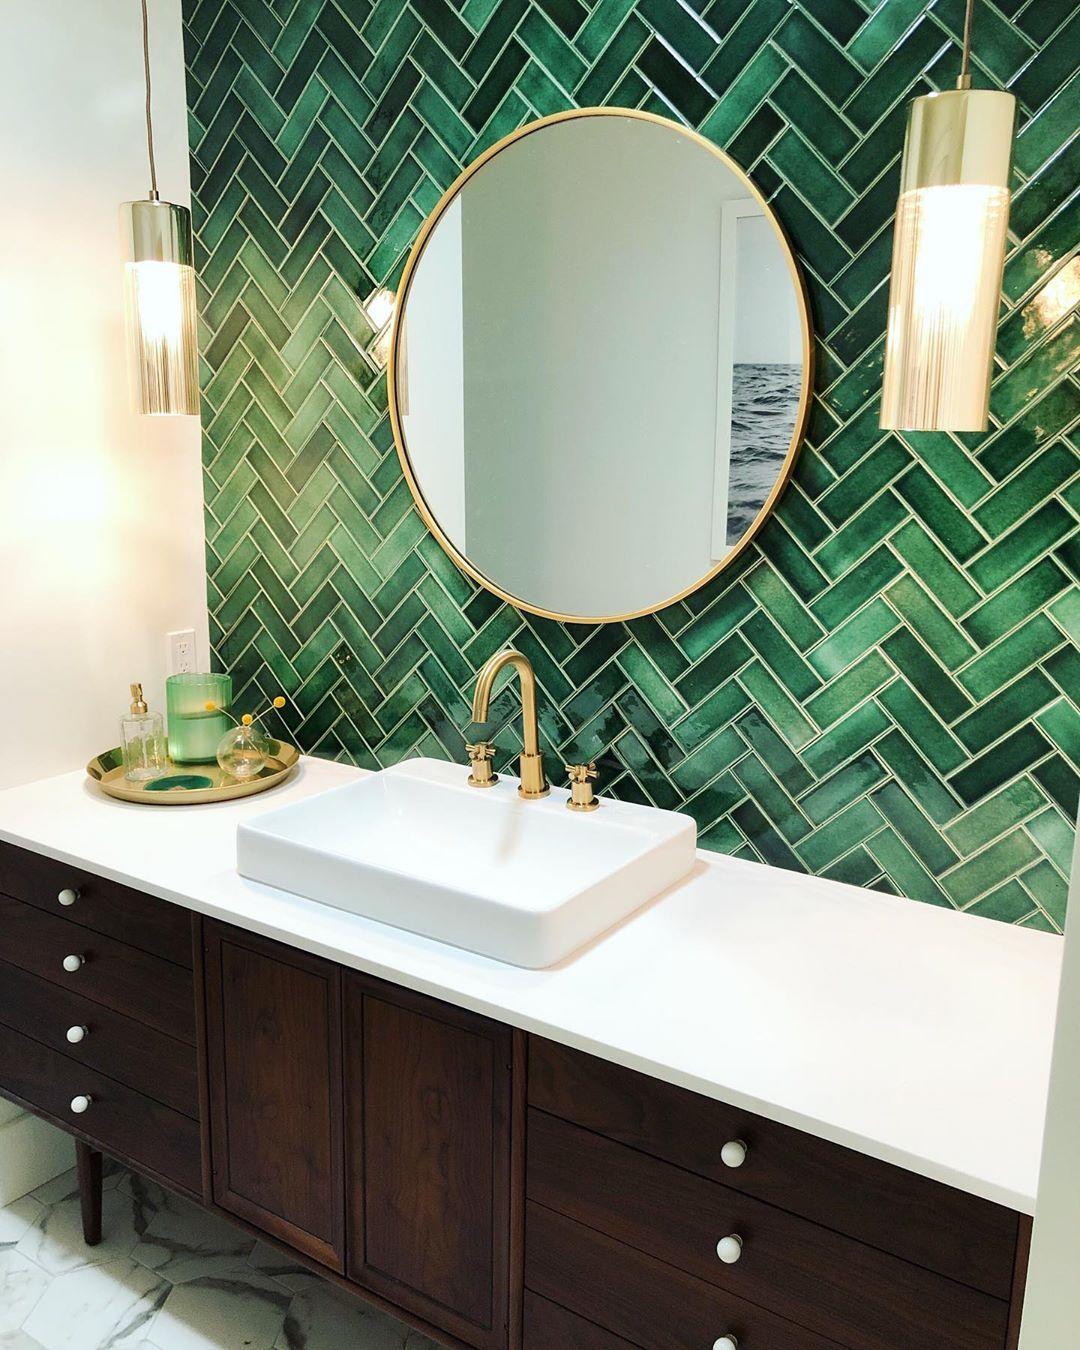 Bathroom goals. 💚🙌🏼Custom imported tile backsplash in ...